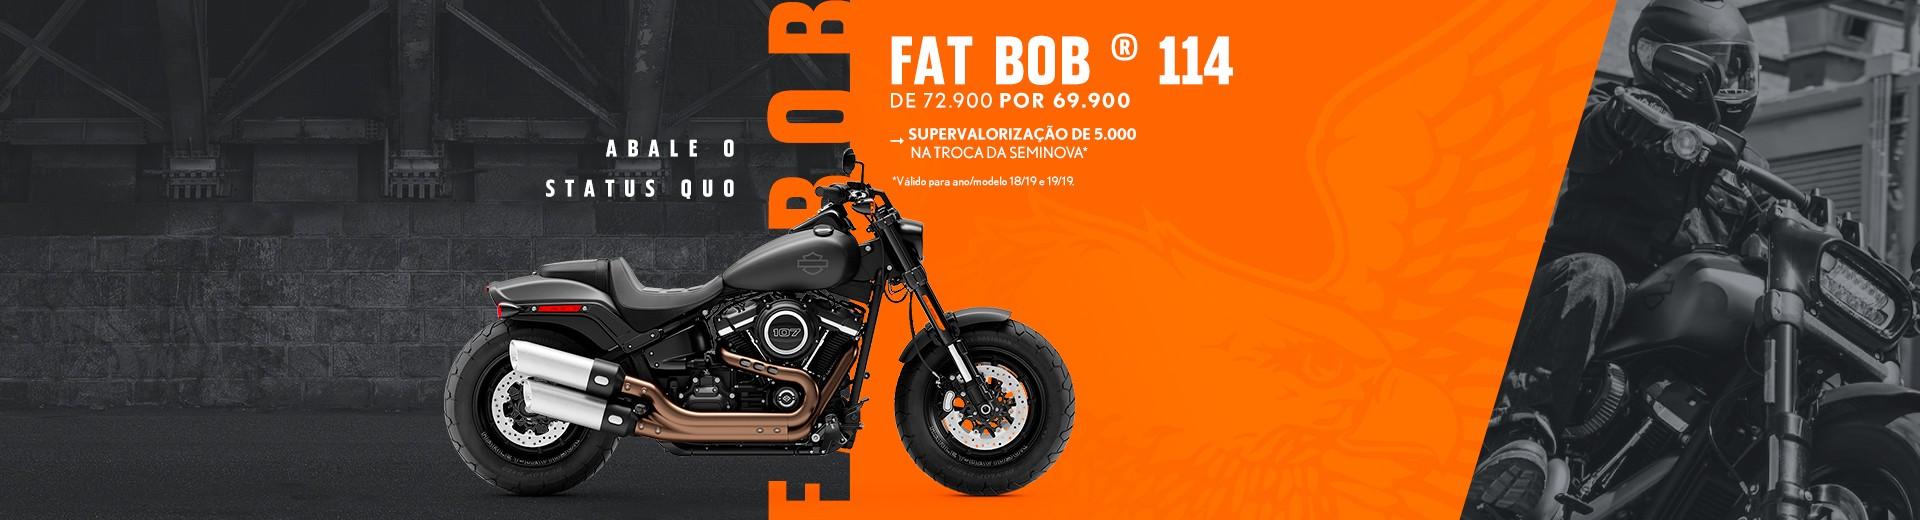 banner-home-fat-bob